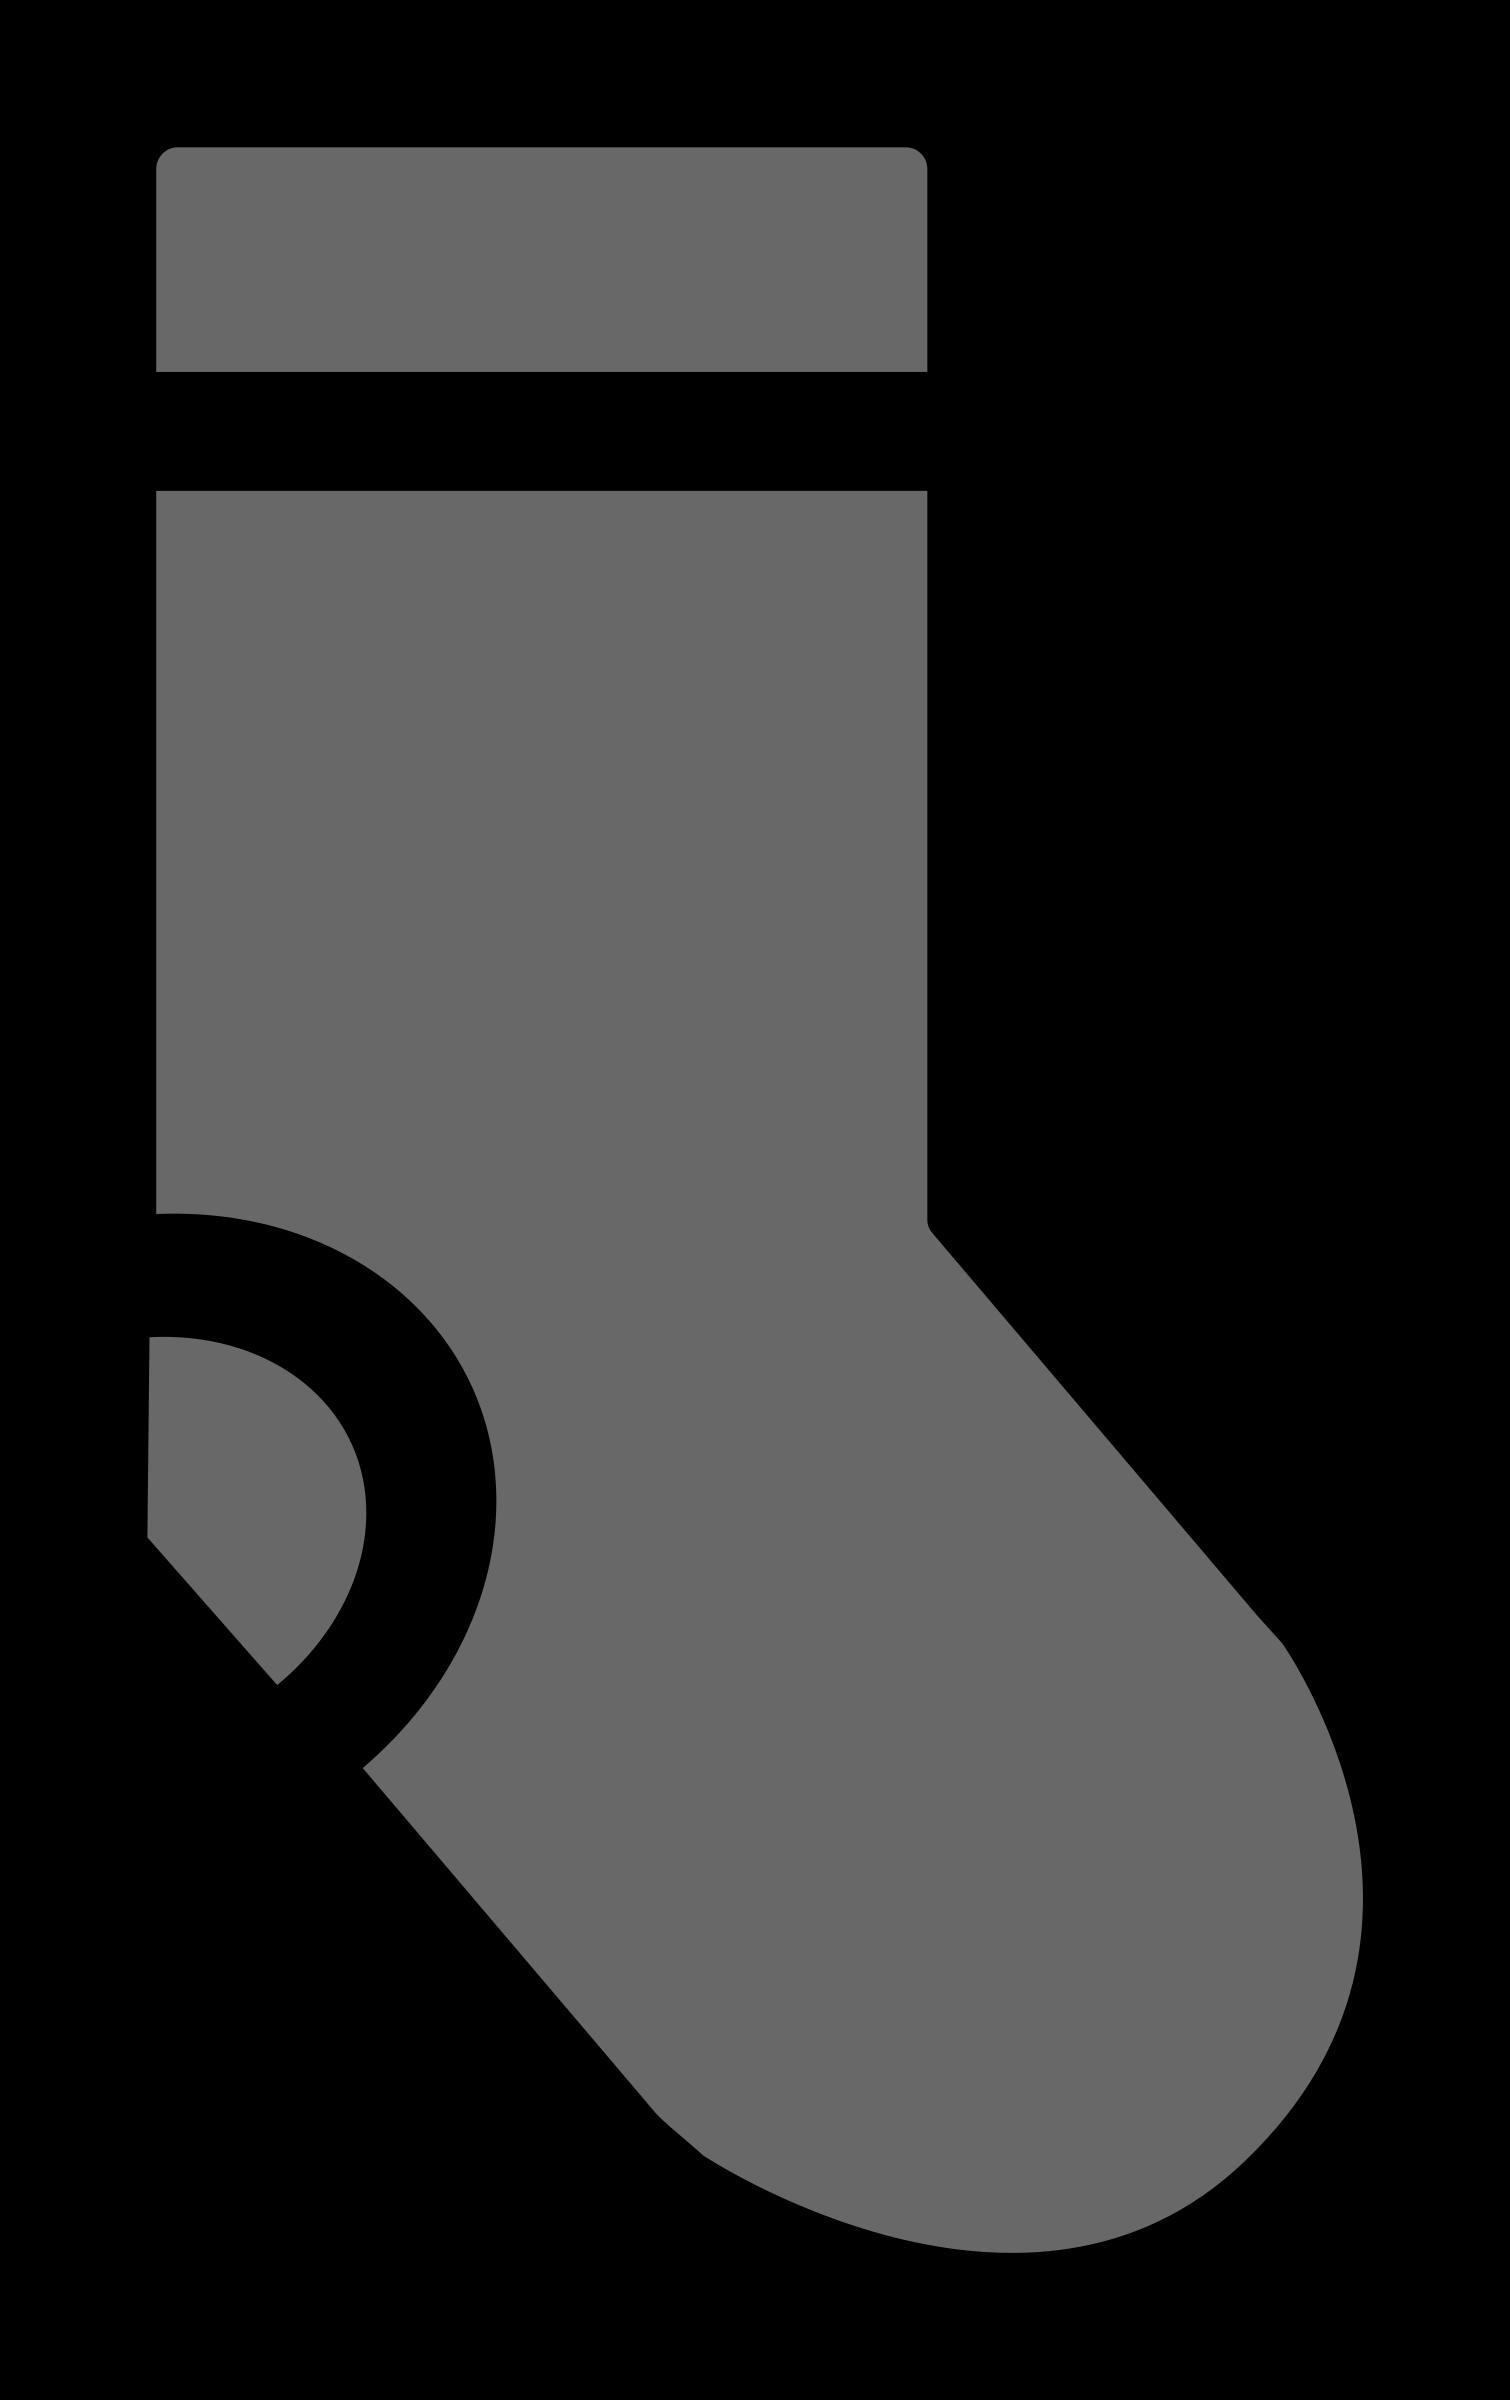 Simple sock big image. White clipart socks